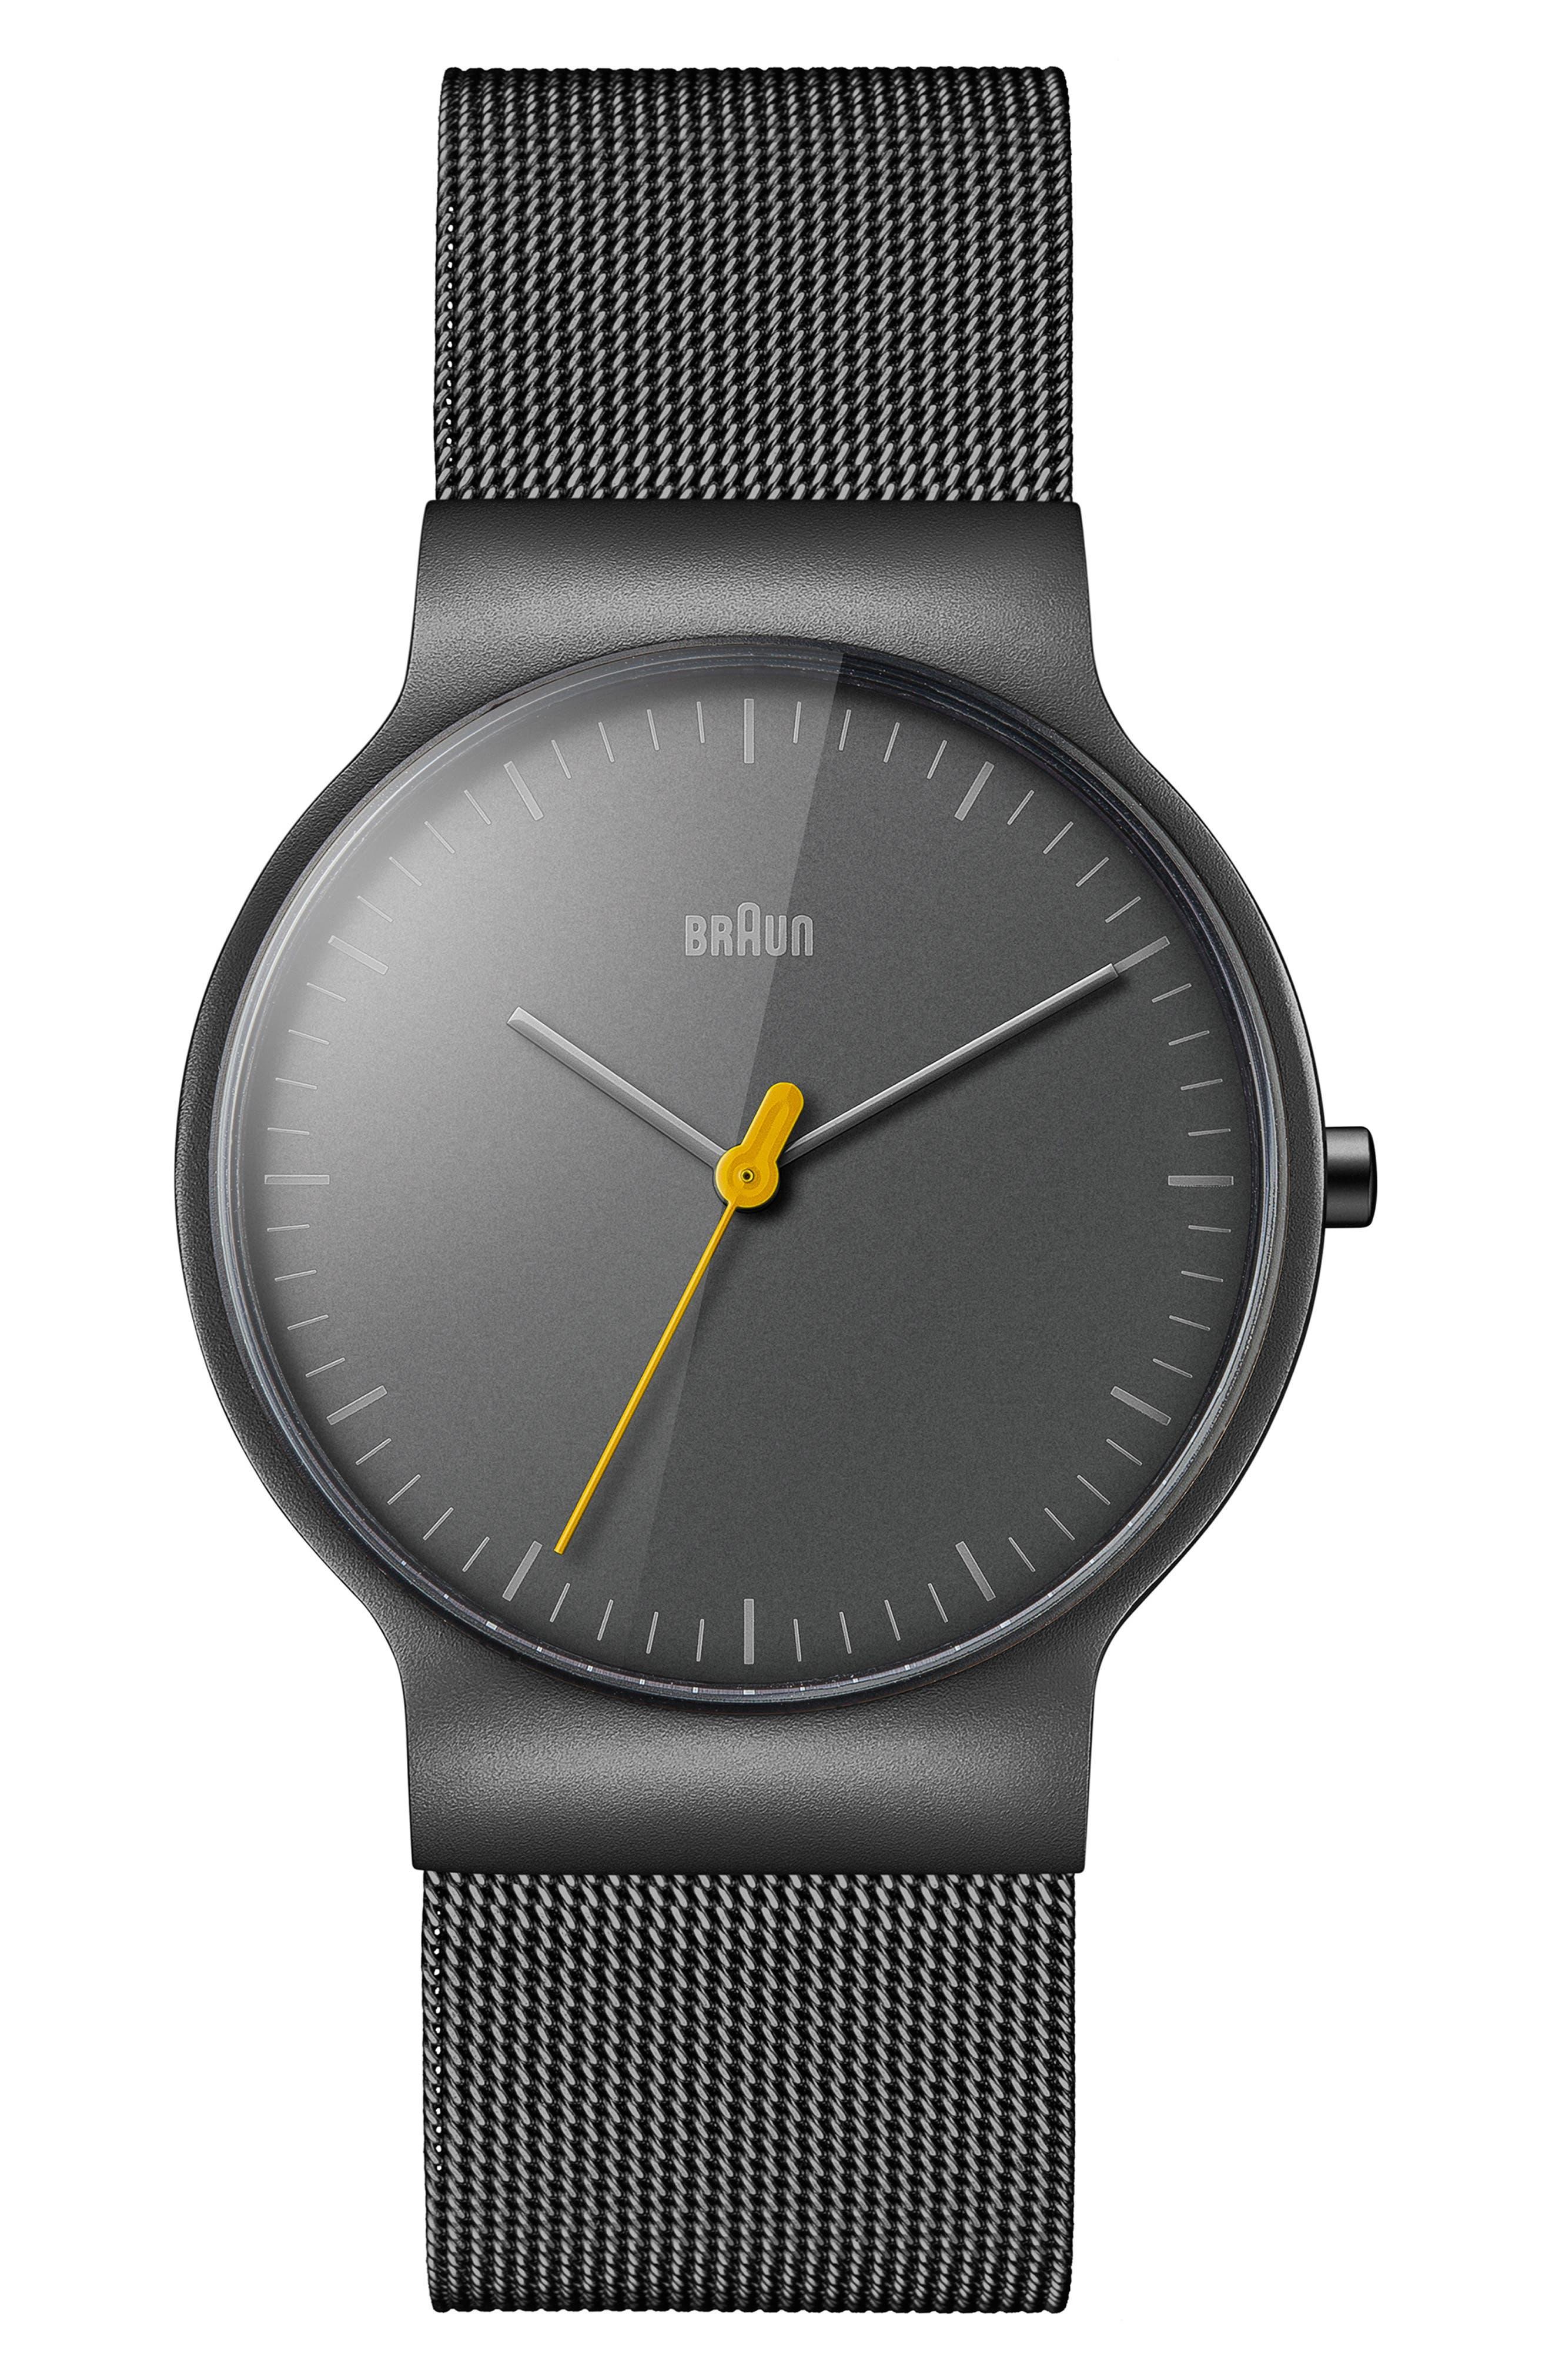 BRAUN Classic Mesh Bracelet Watch, 38Mm in Black/ Gunmetal